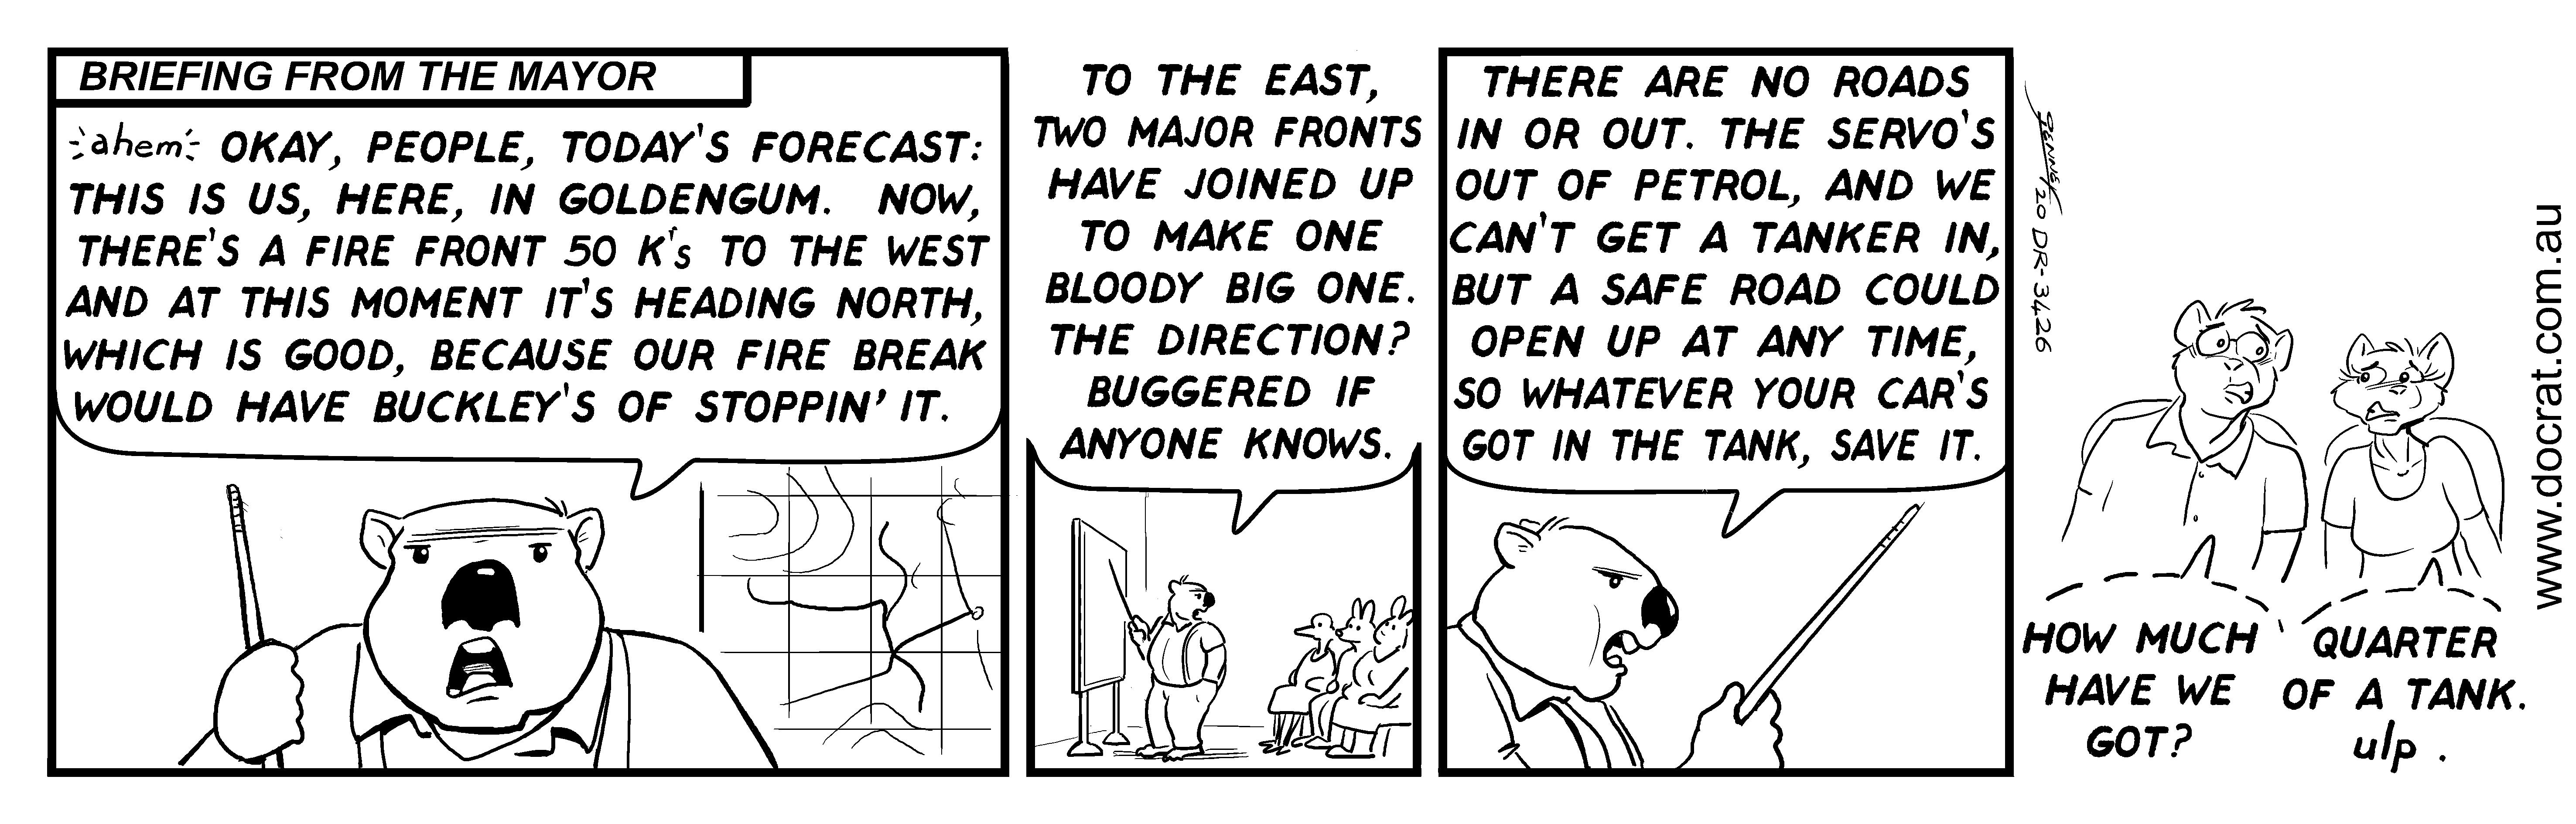 20200302